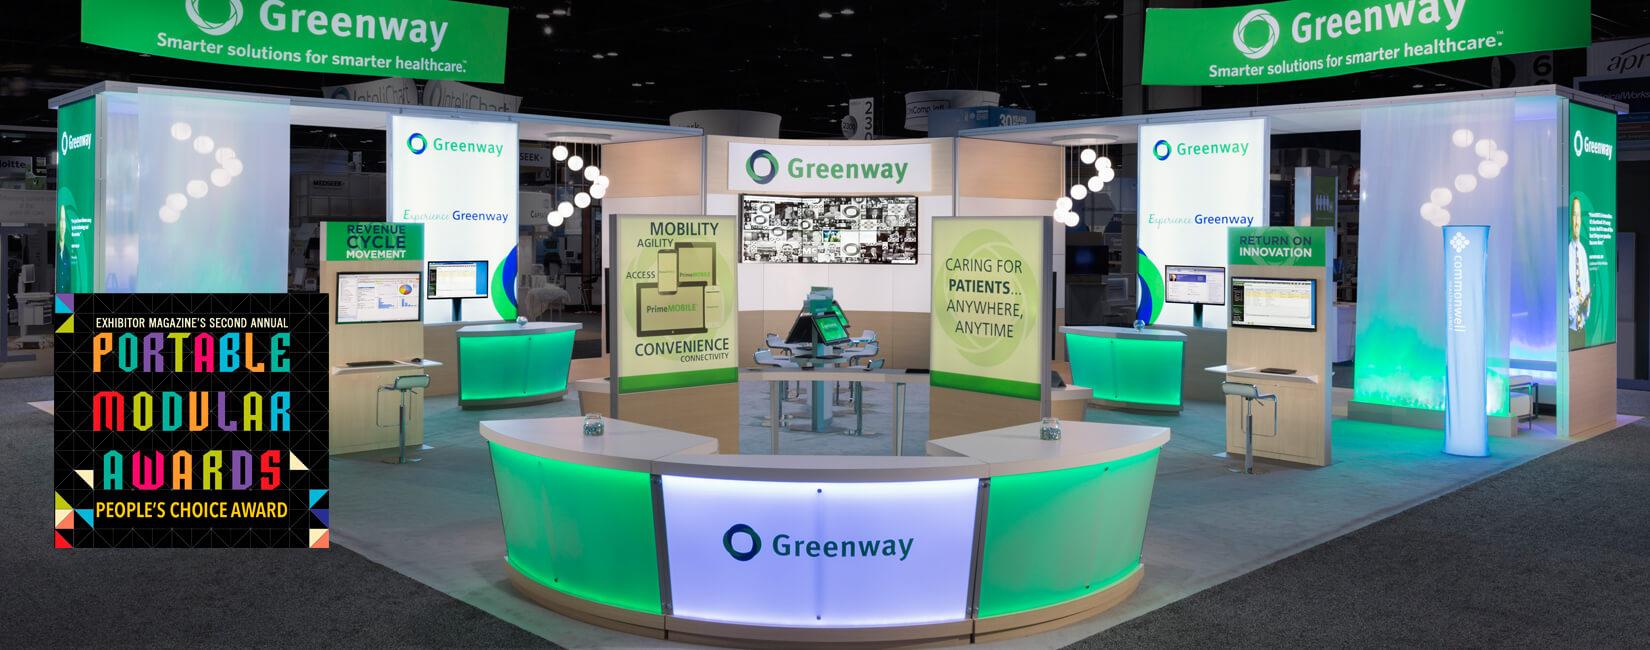 Greenway-1650x650